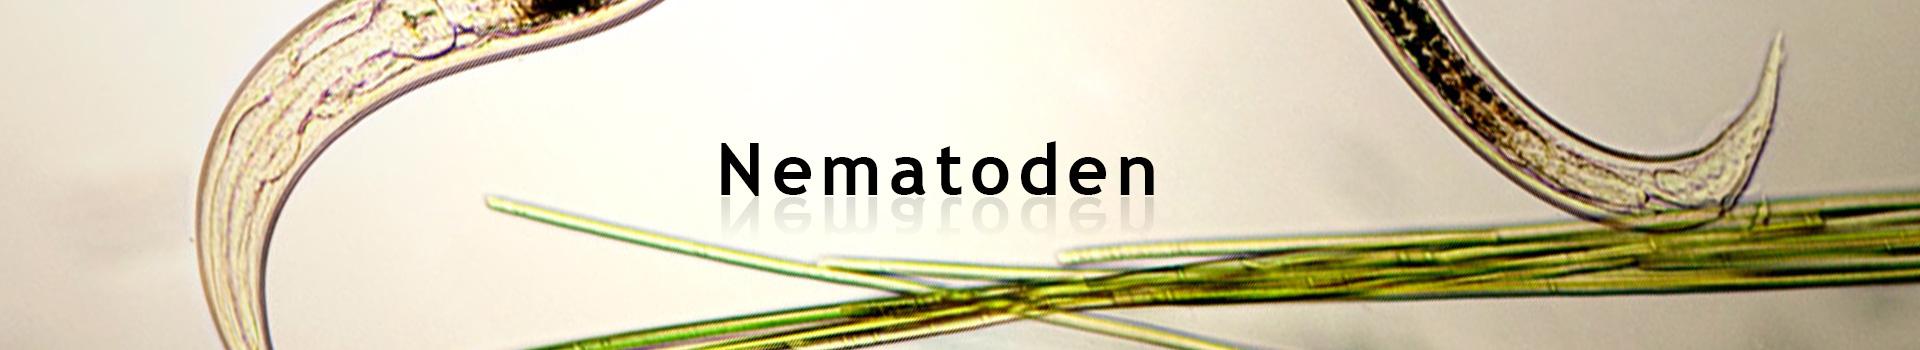 Kategoribillede_Nematoder_DE